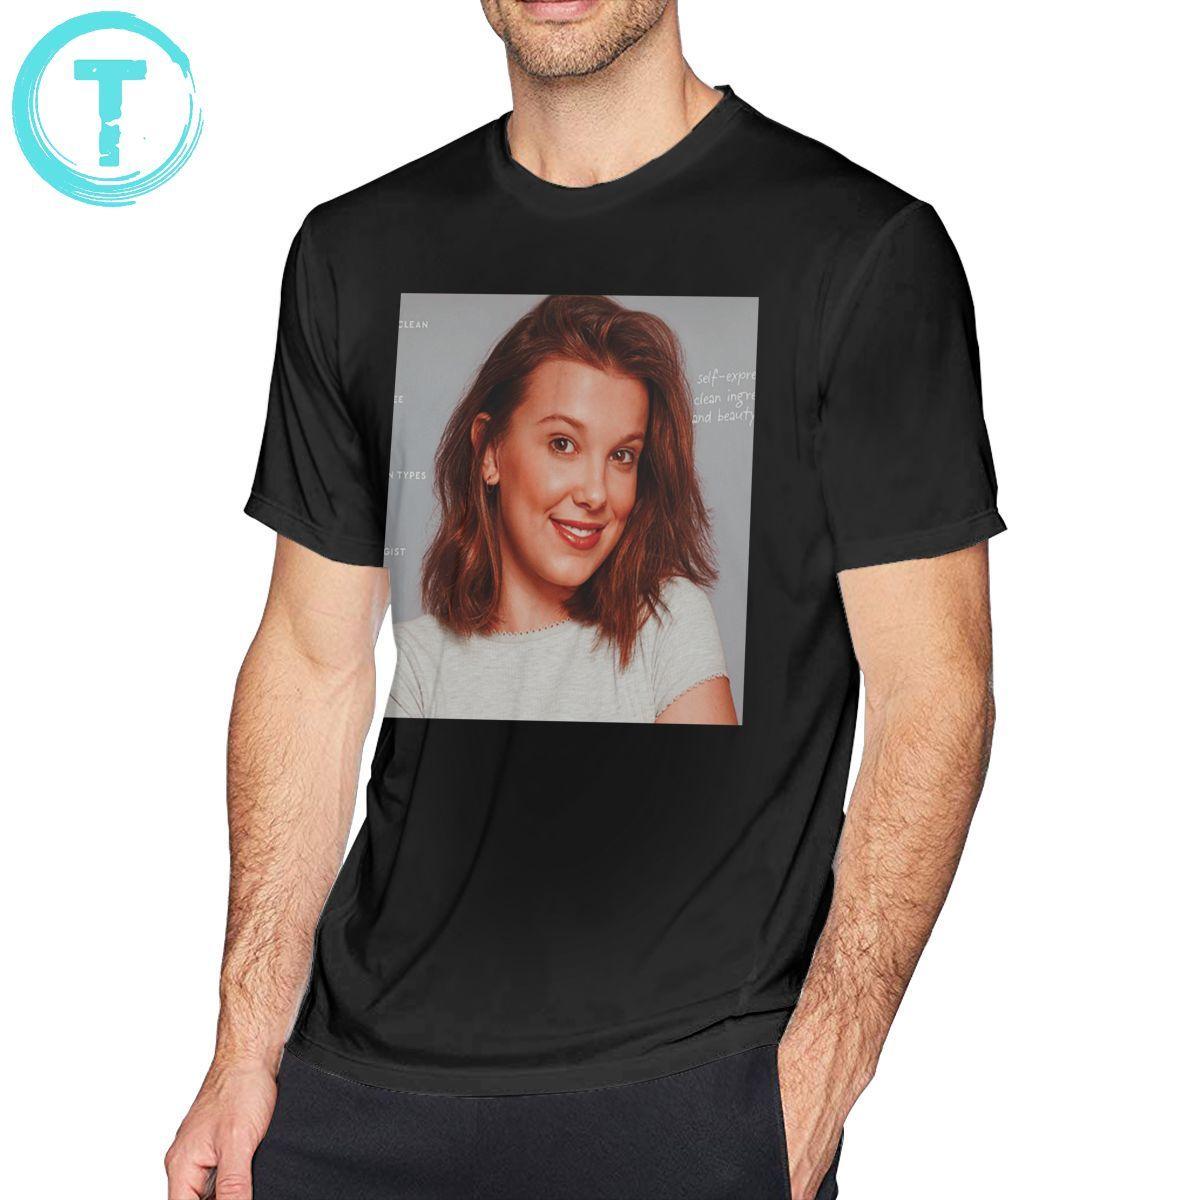 Millie Bobby Brown T Shirt Millie Bobby Brown Polaroid T-Shirt Print Cotton Tee Shirt Man Fashion Tshirt